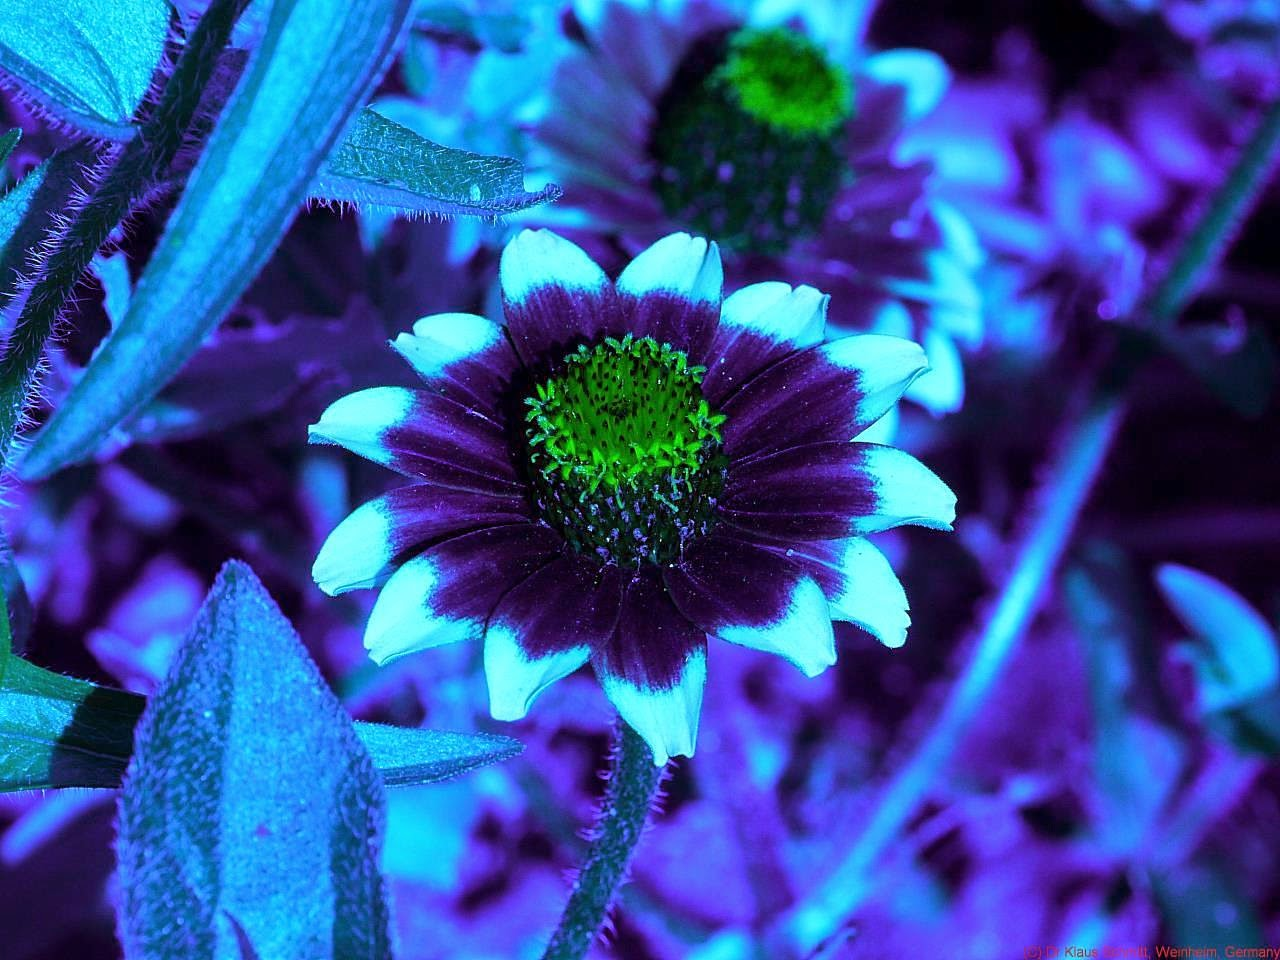 Flower in ultraviolet light uv vision